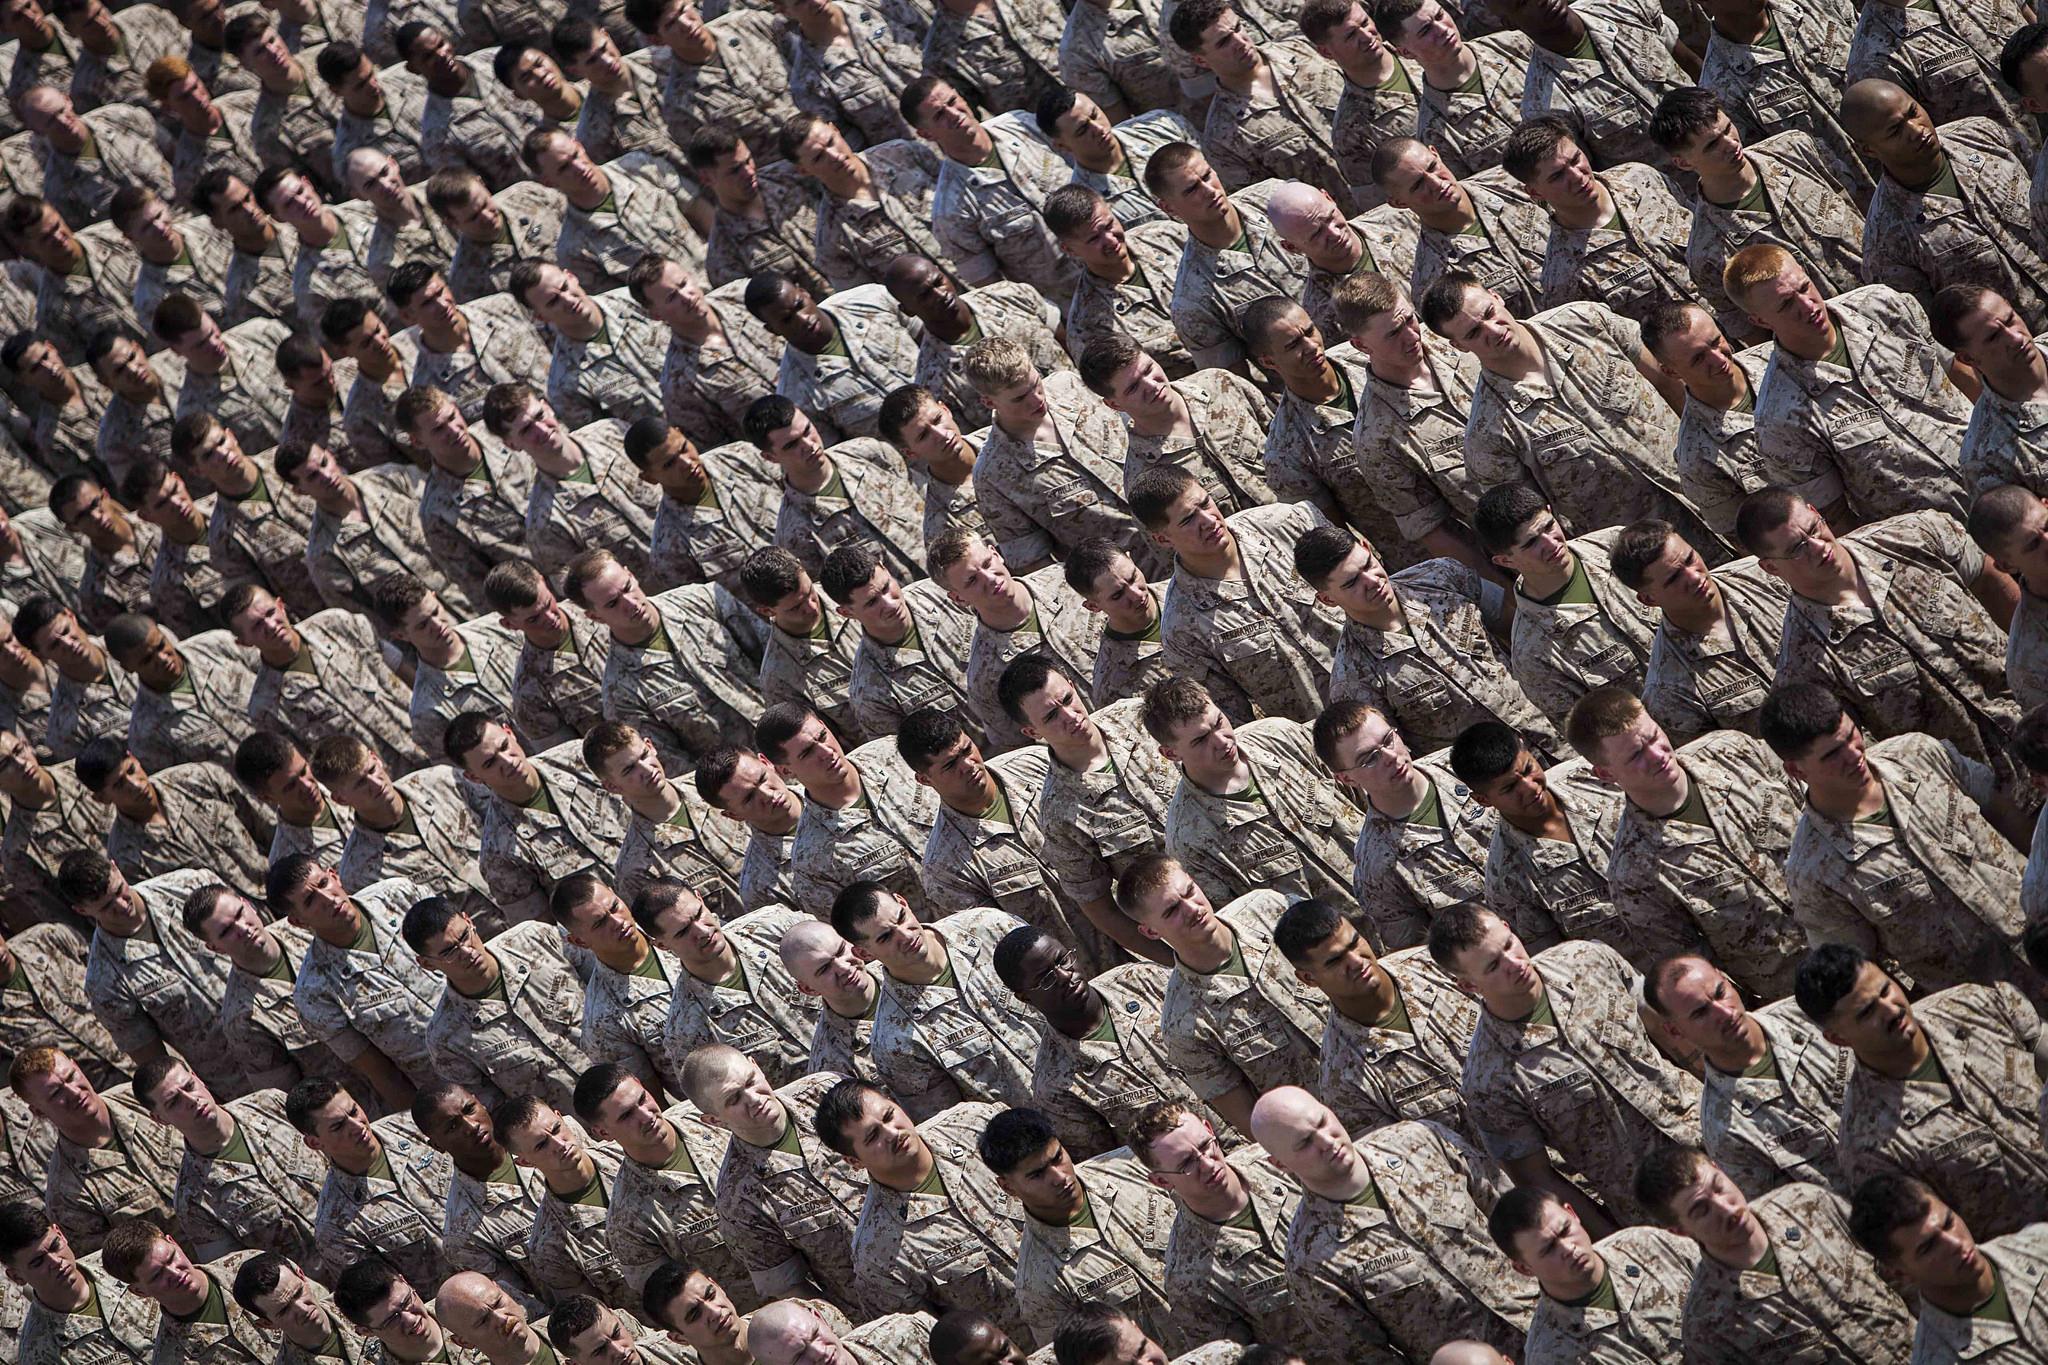 Marines 22nd MEU